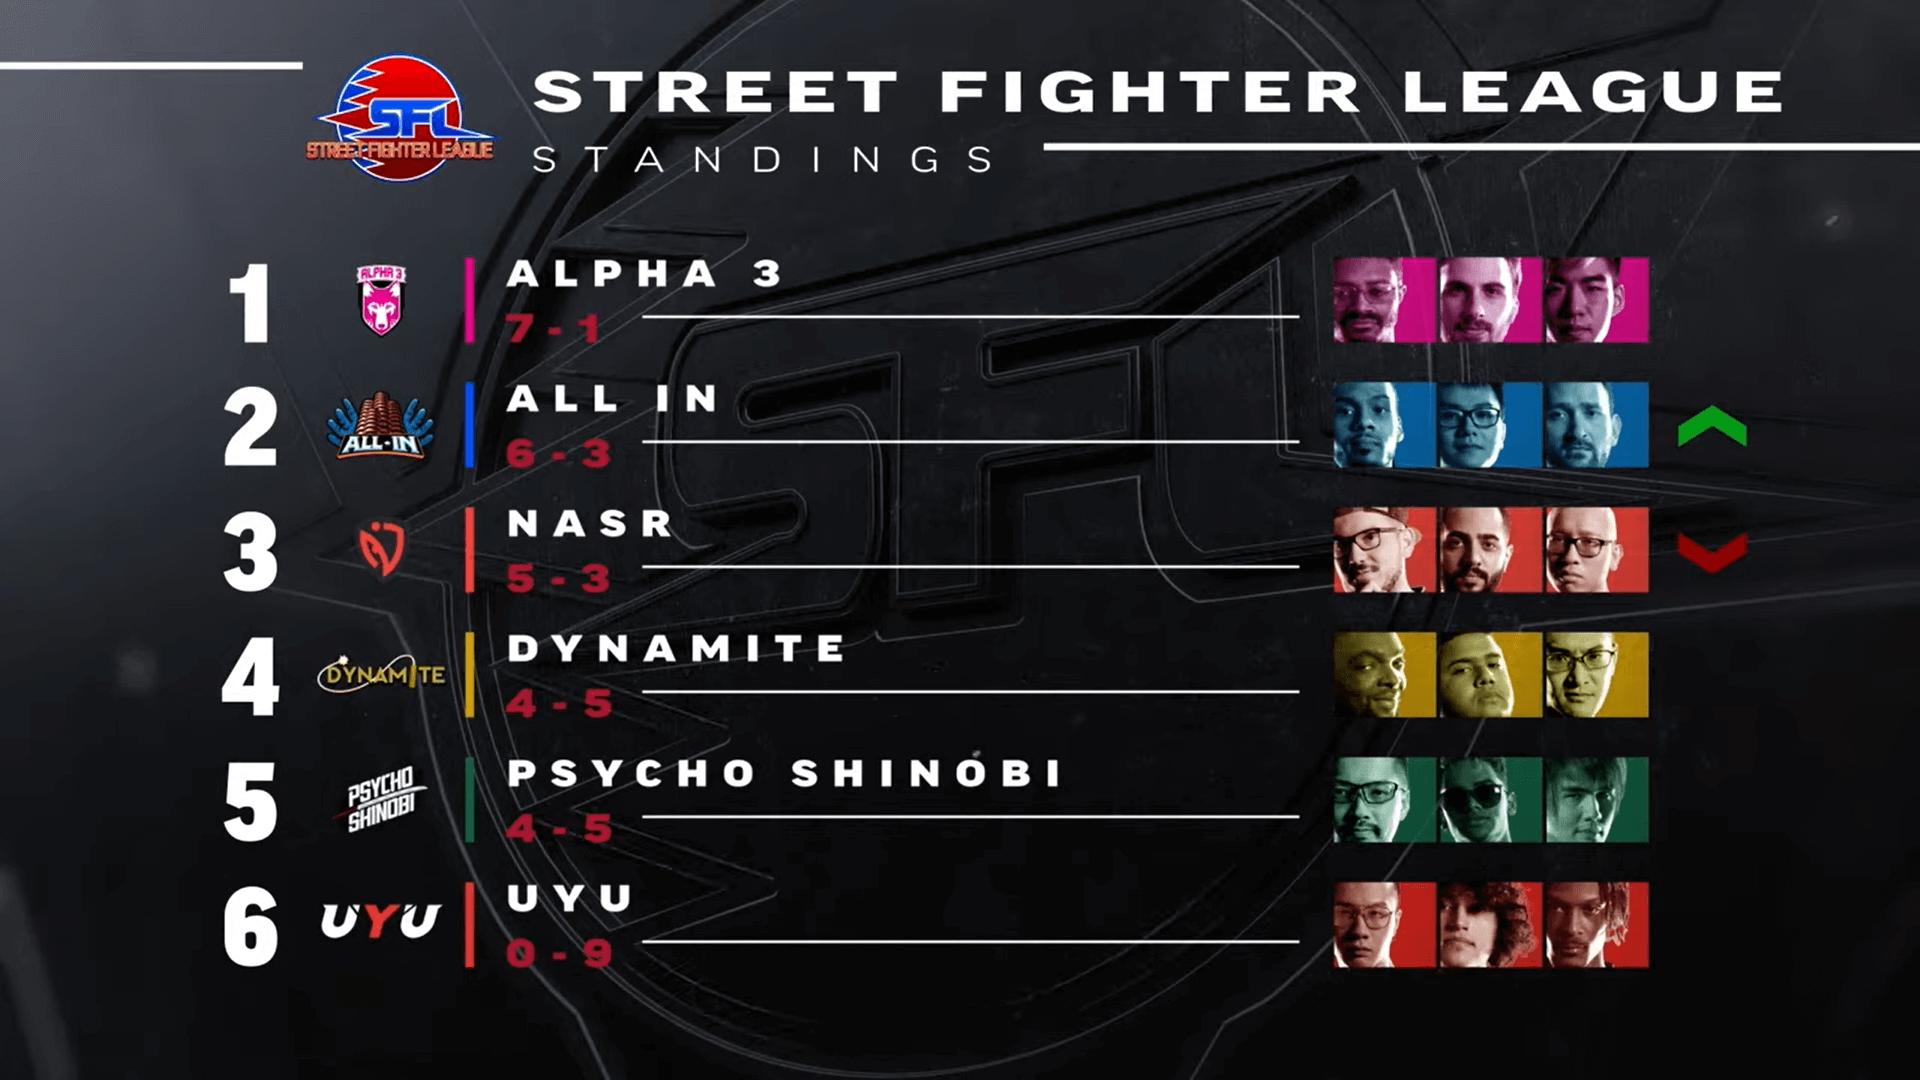 Street Fighter League Pro-US, standings after Week 13